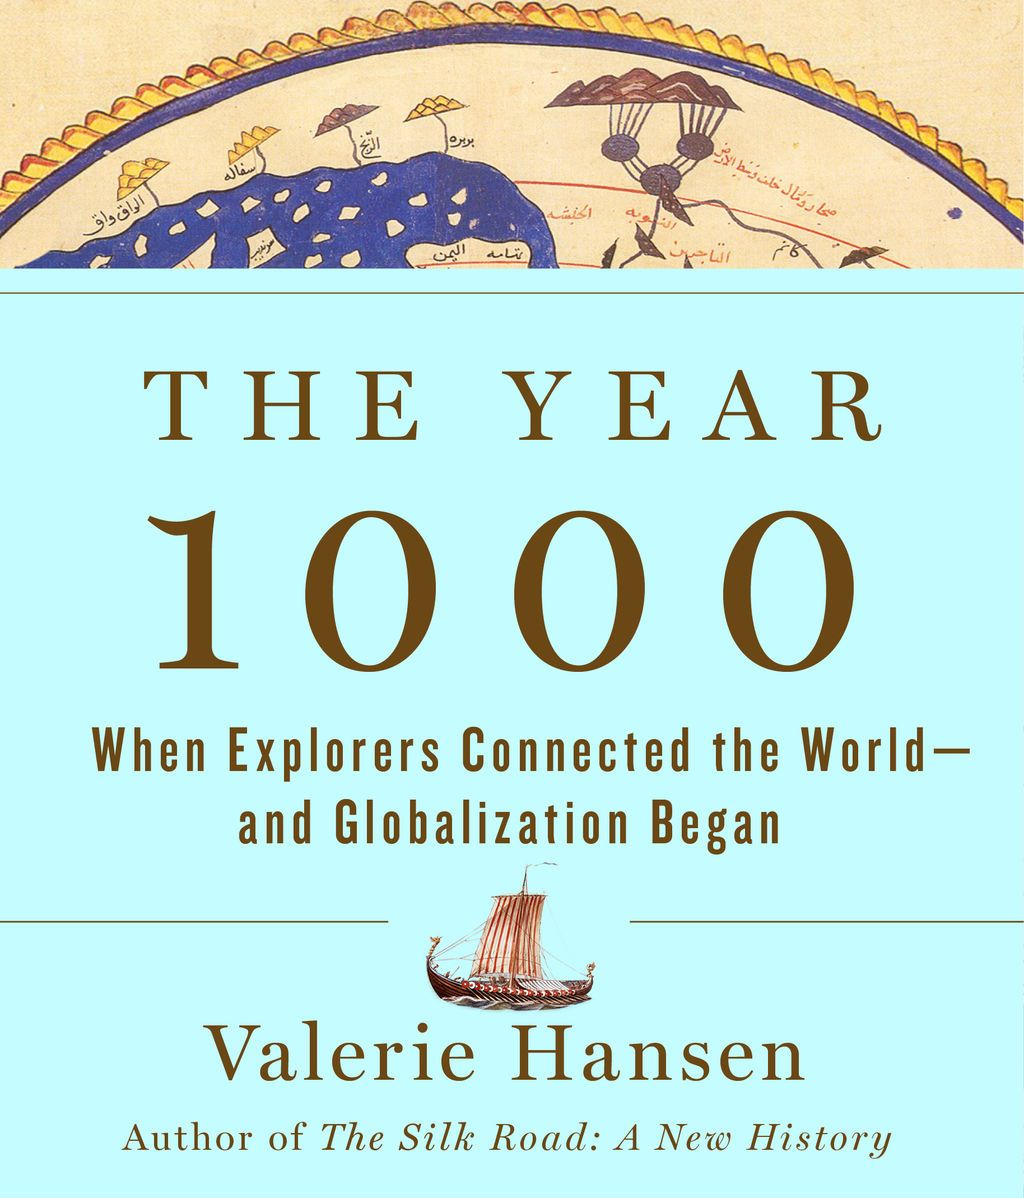 Porttada de The Year 1000